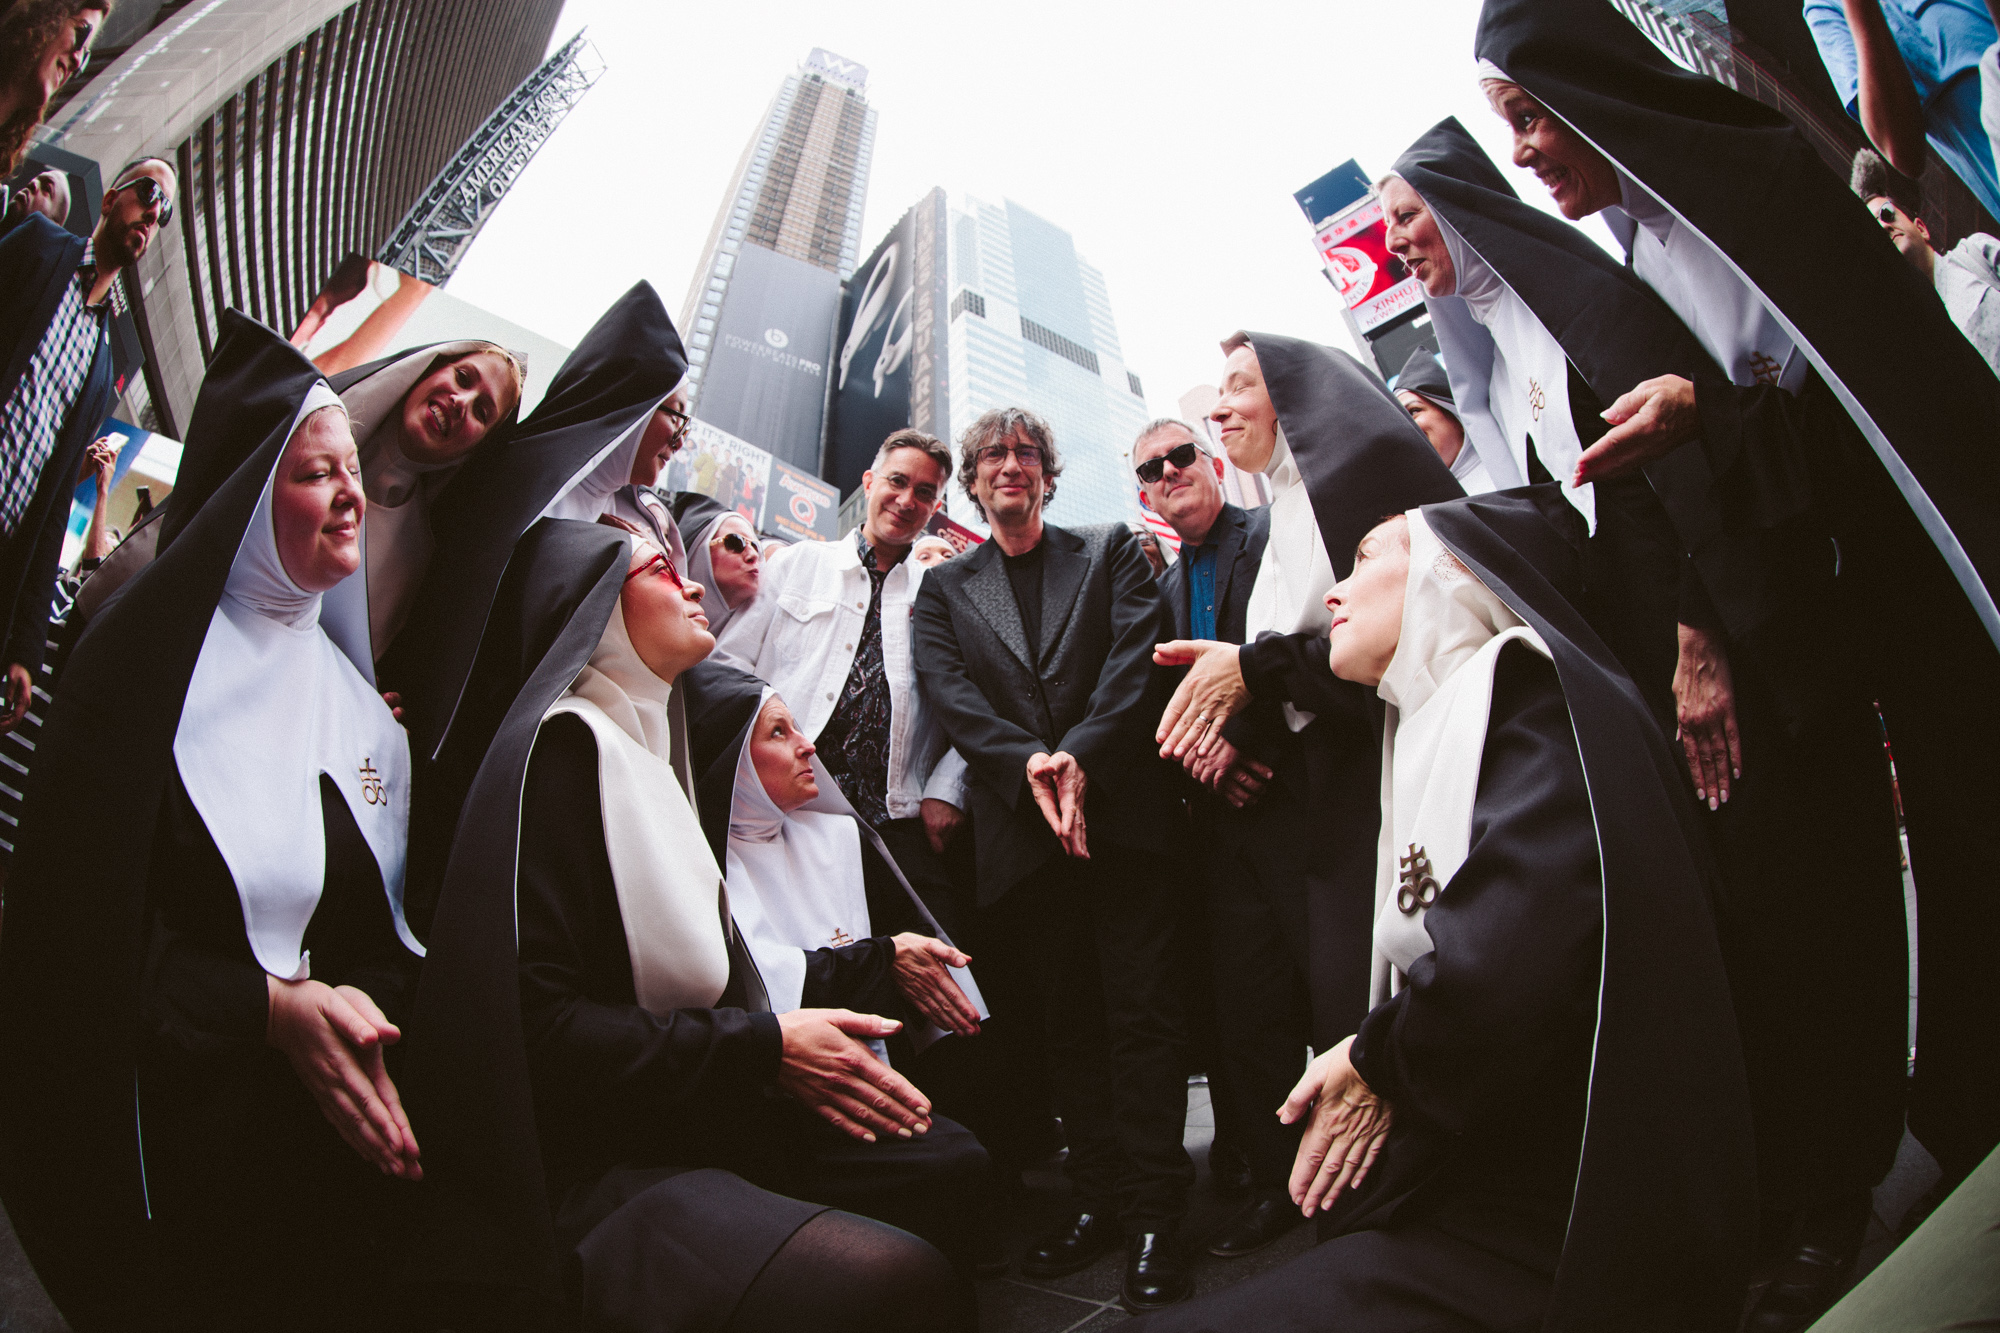 7 Good omens chattering nuns hal kirkland.jpg